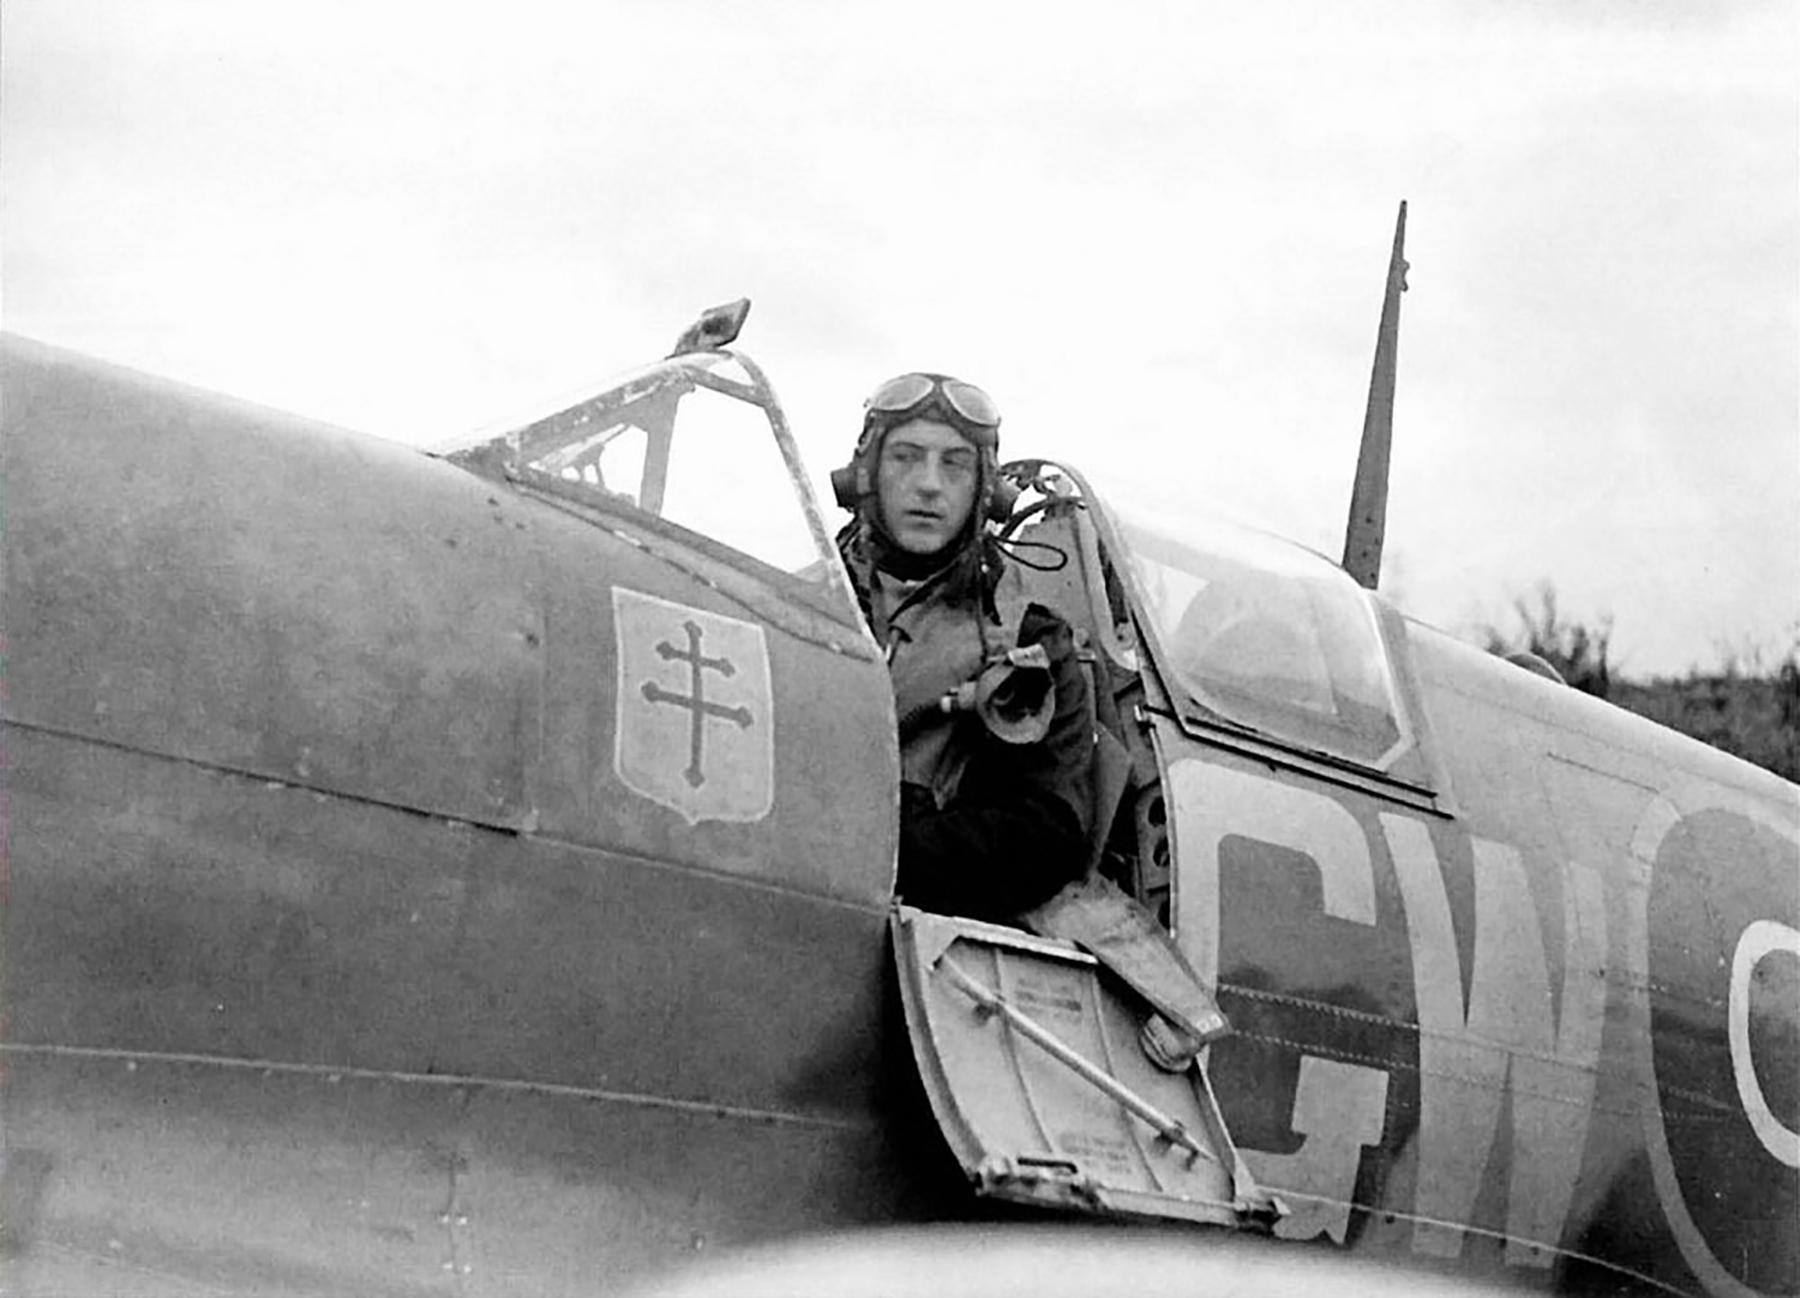 Spitfire MkIX RAF 340Sqn GWP Nastupcem Duperiera BS244 England 1942 01